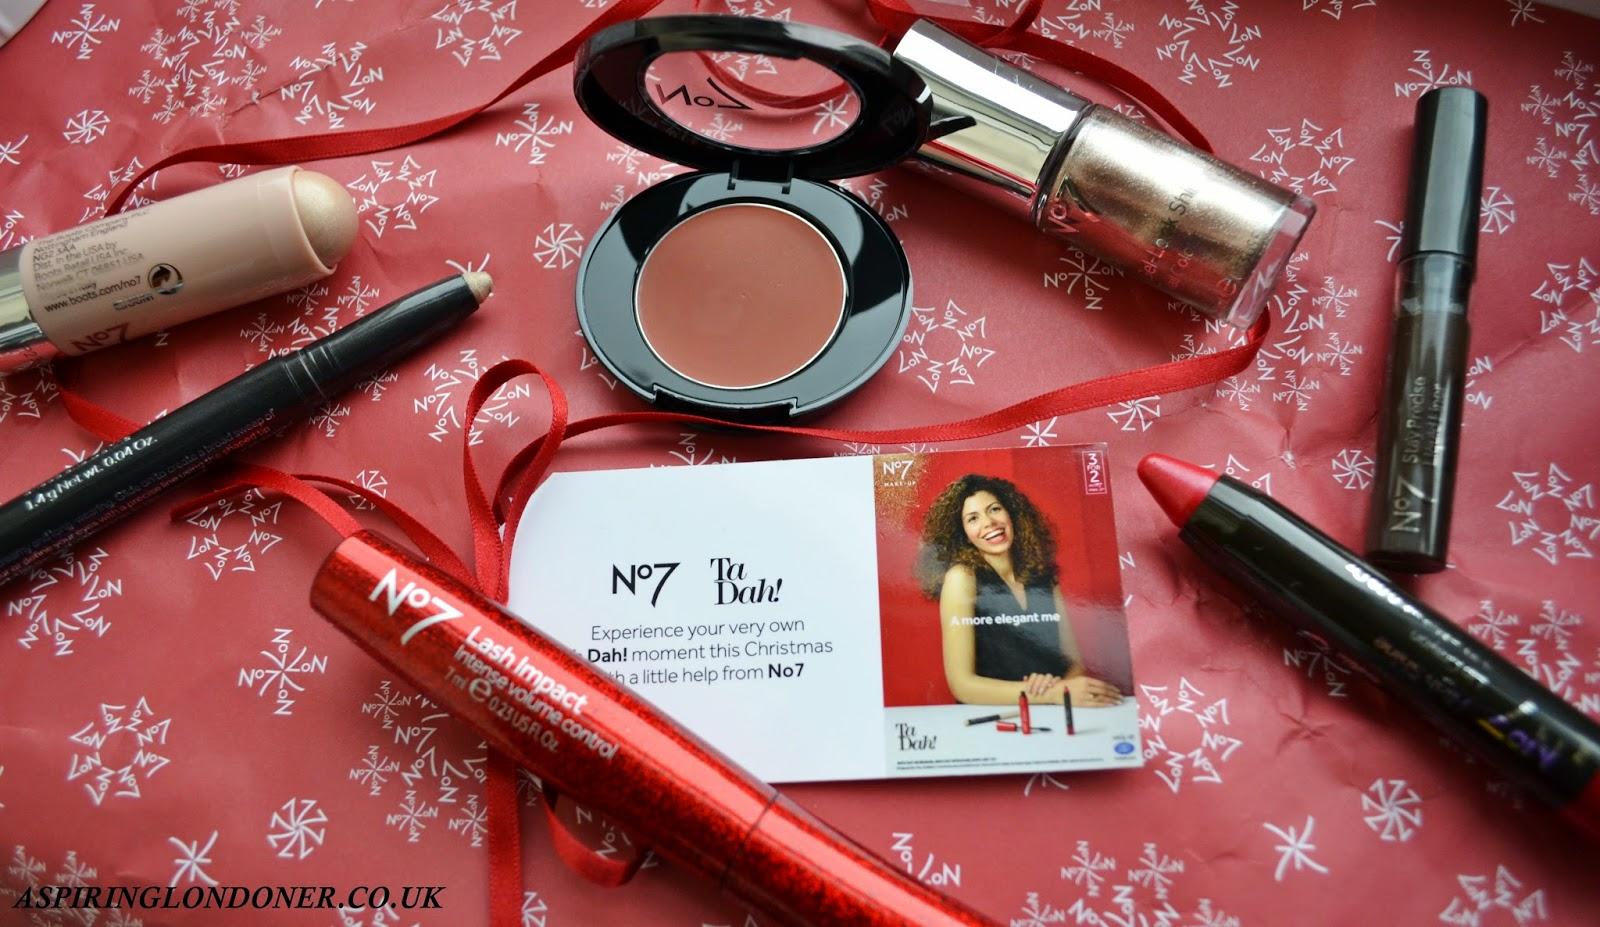 No7 Makeup Inspirations Get The Look Day-to-Night Chic #TaDah - Aspiring Londoner